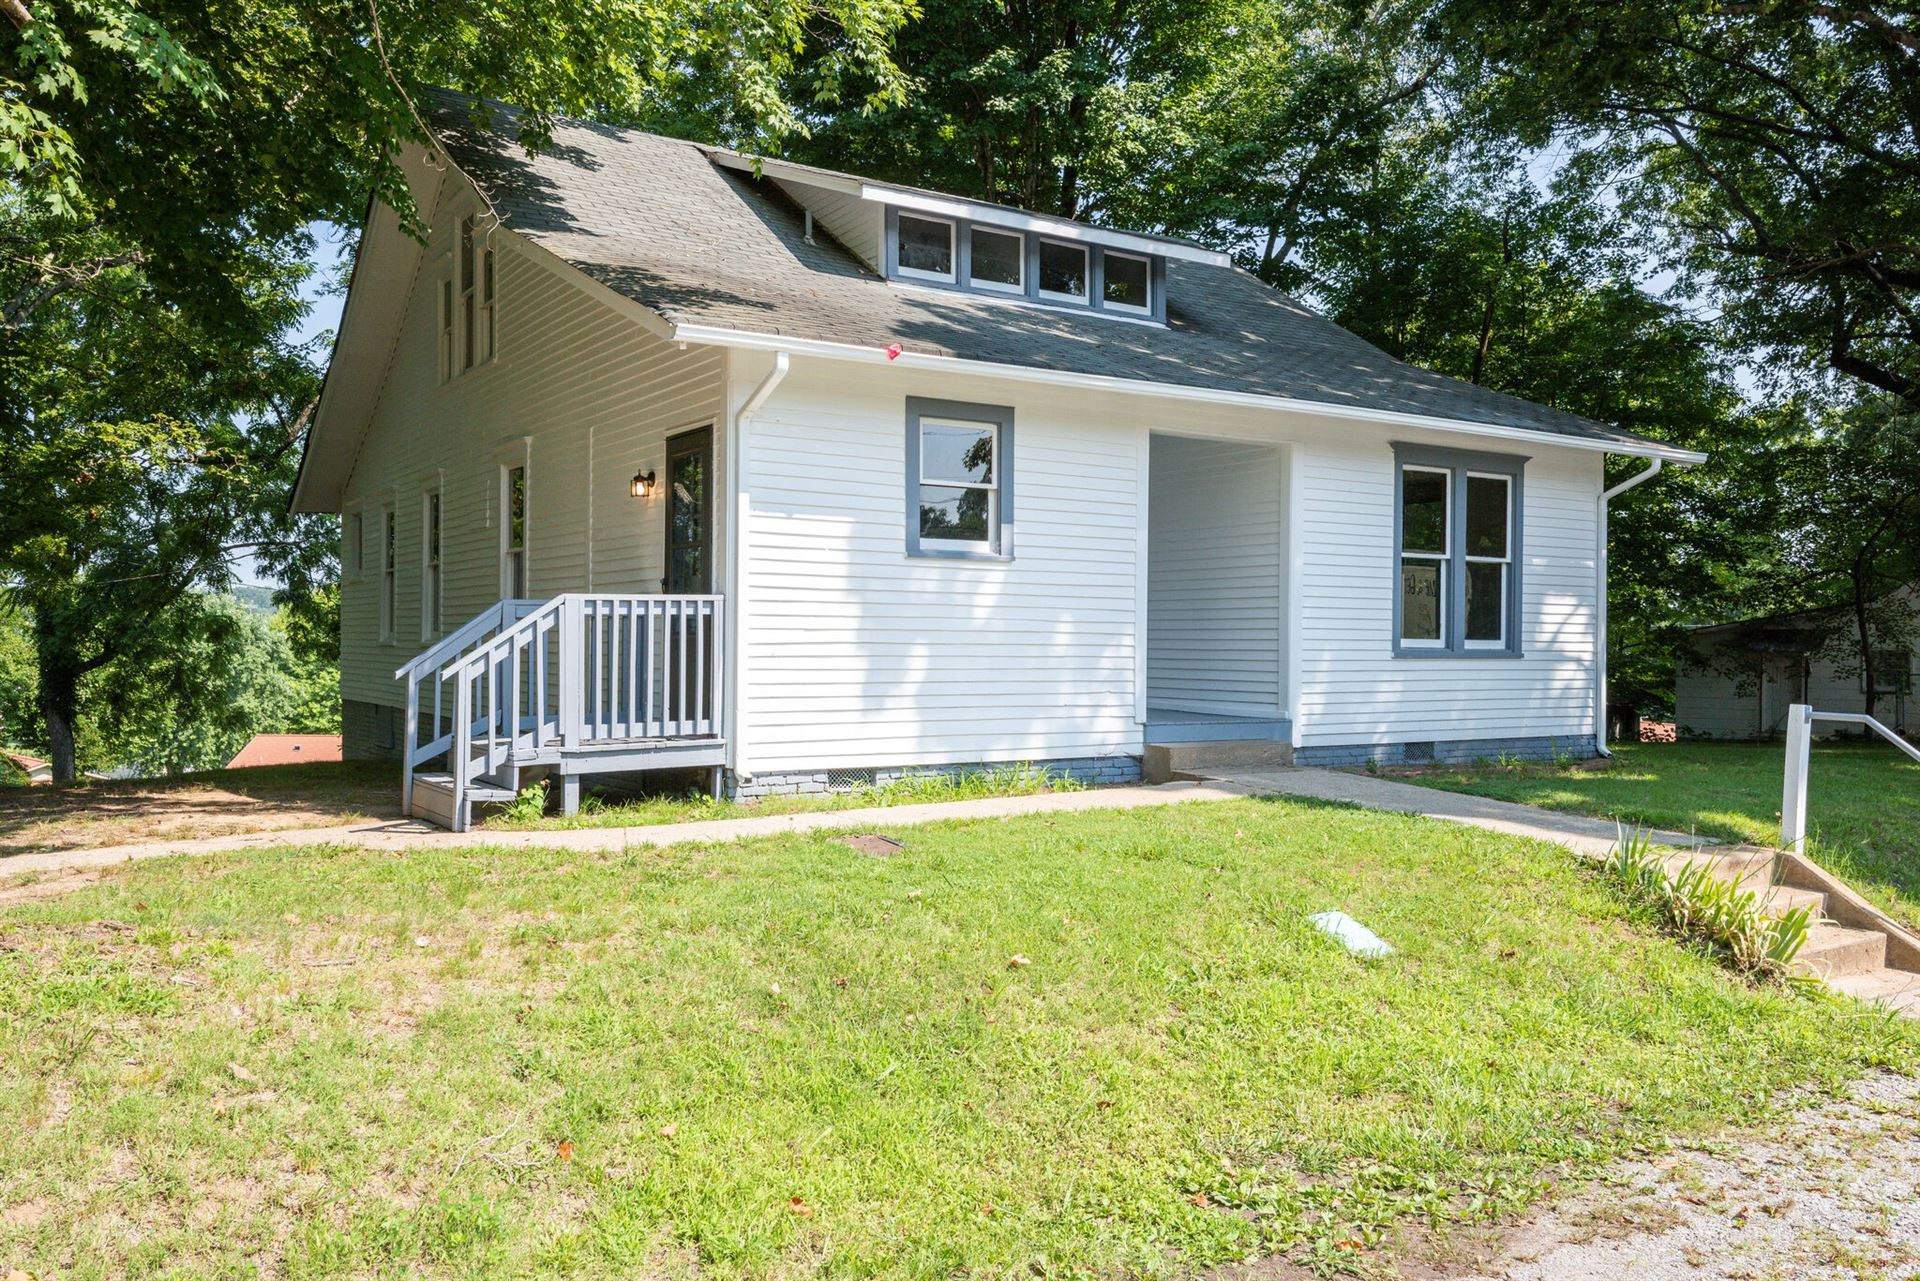 516 N Main St, Dickson, TN 37055 - MLS#: 2271512